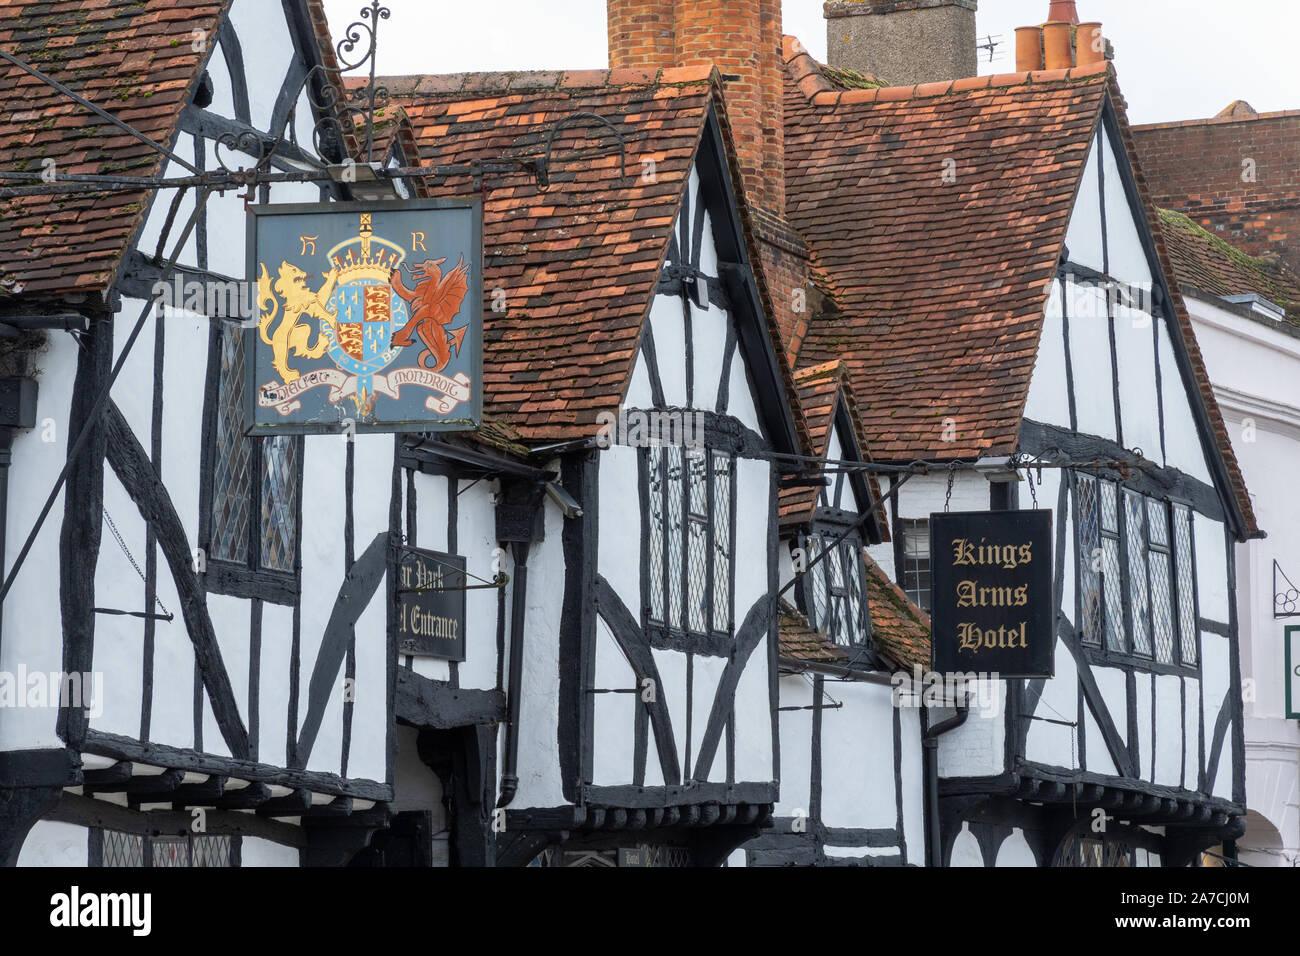 kings-arms-hotel-on-the-high-street-in-amersham-old-town-buckinghamshire-uk-2A7CJ0M.jpg